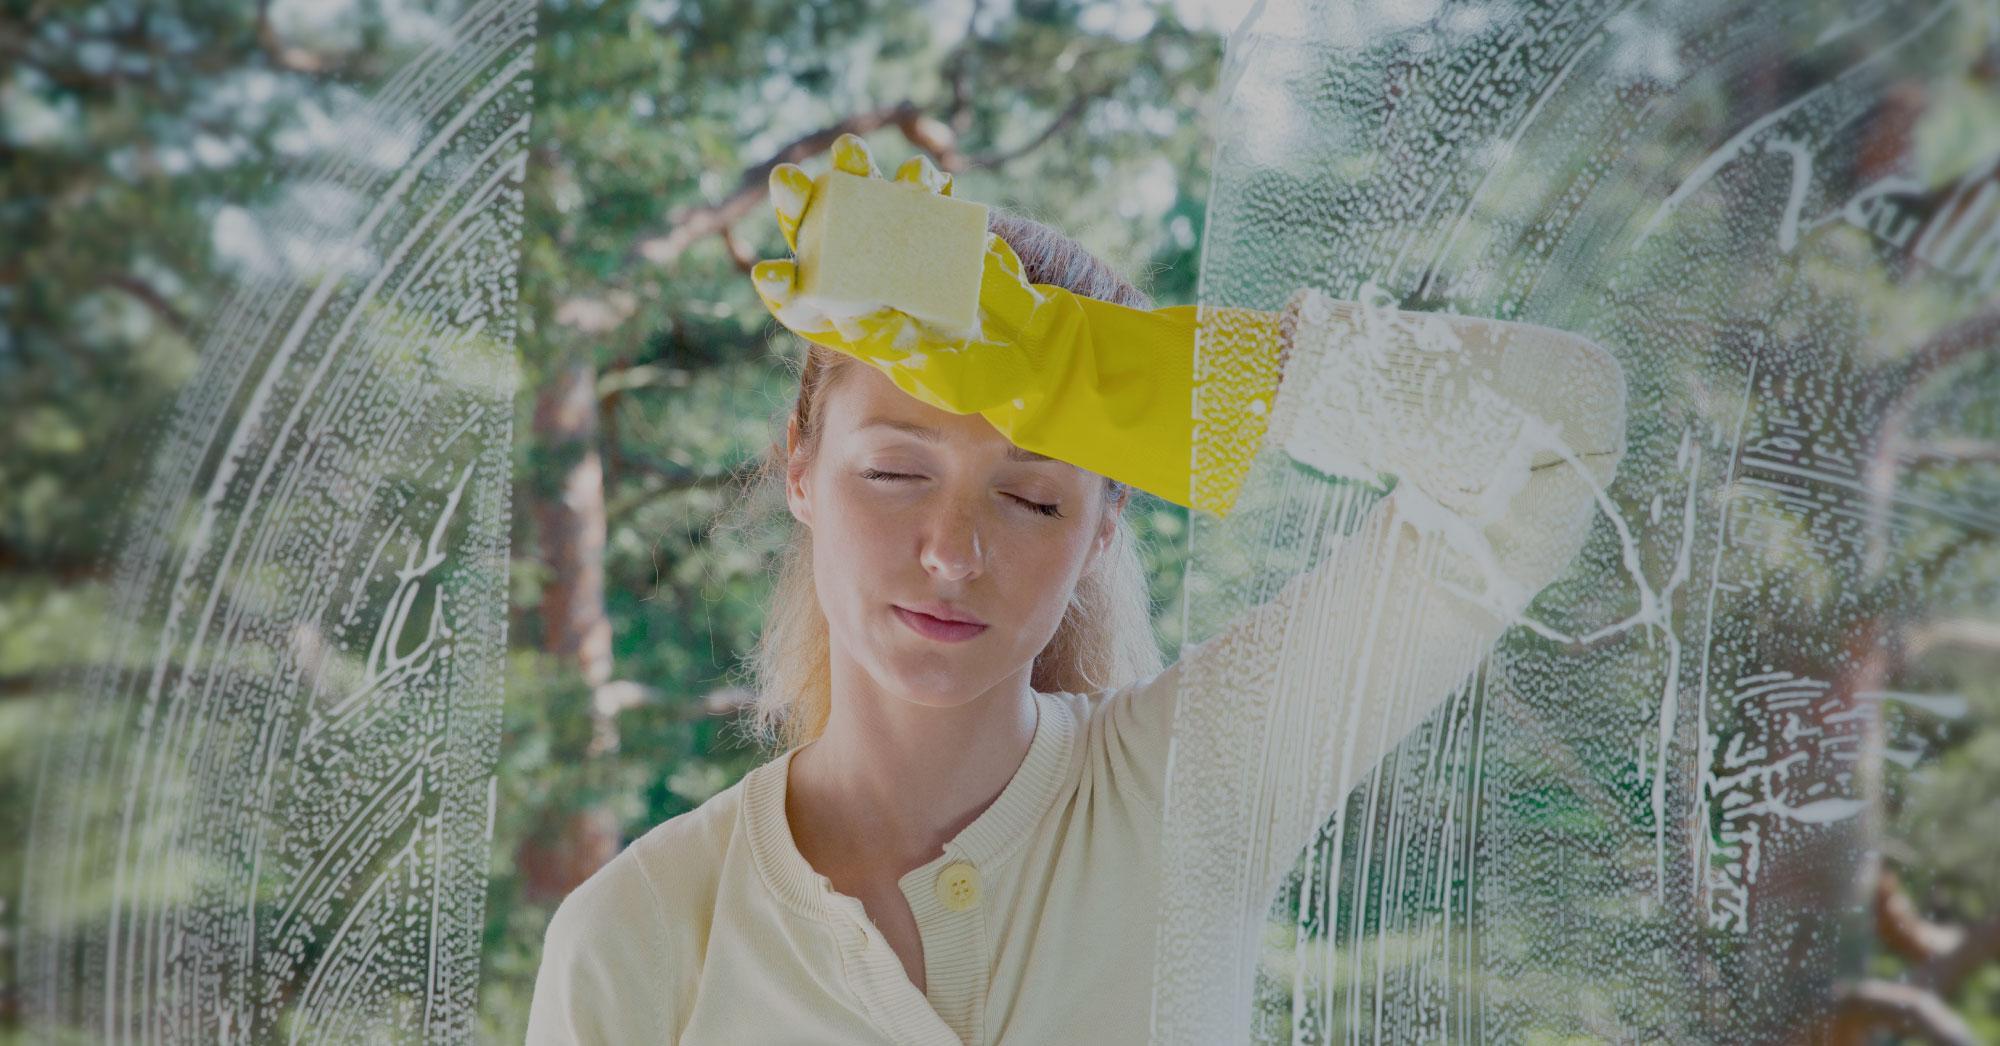 Cinque segreti per lavare i vetri a regola d'arte